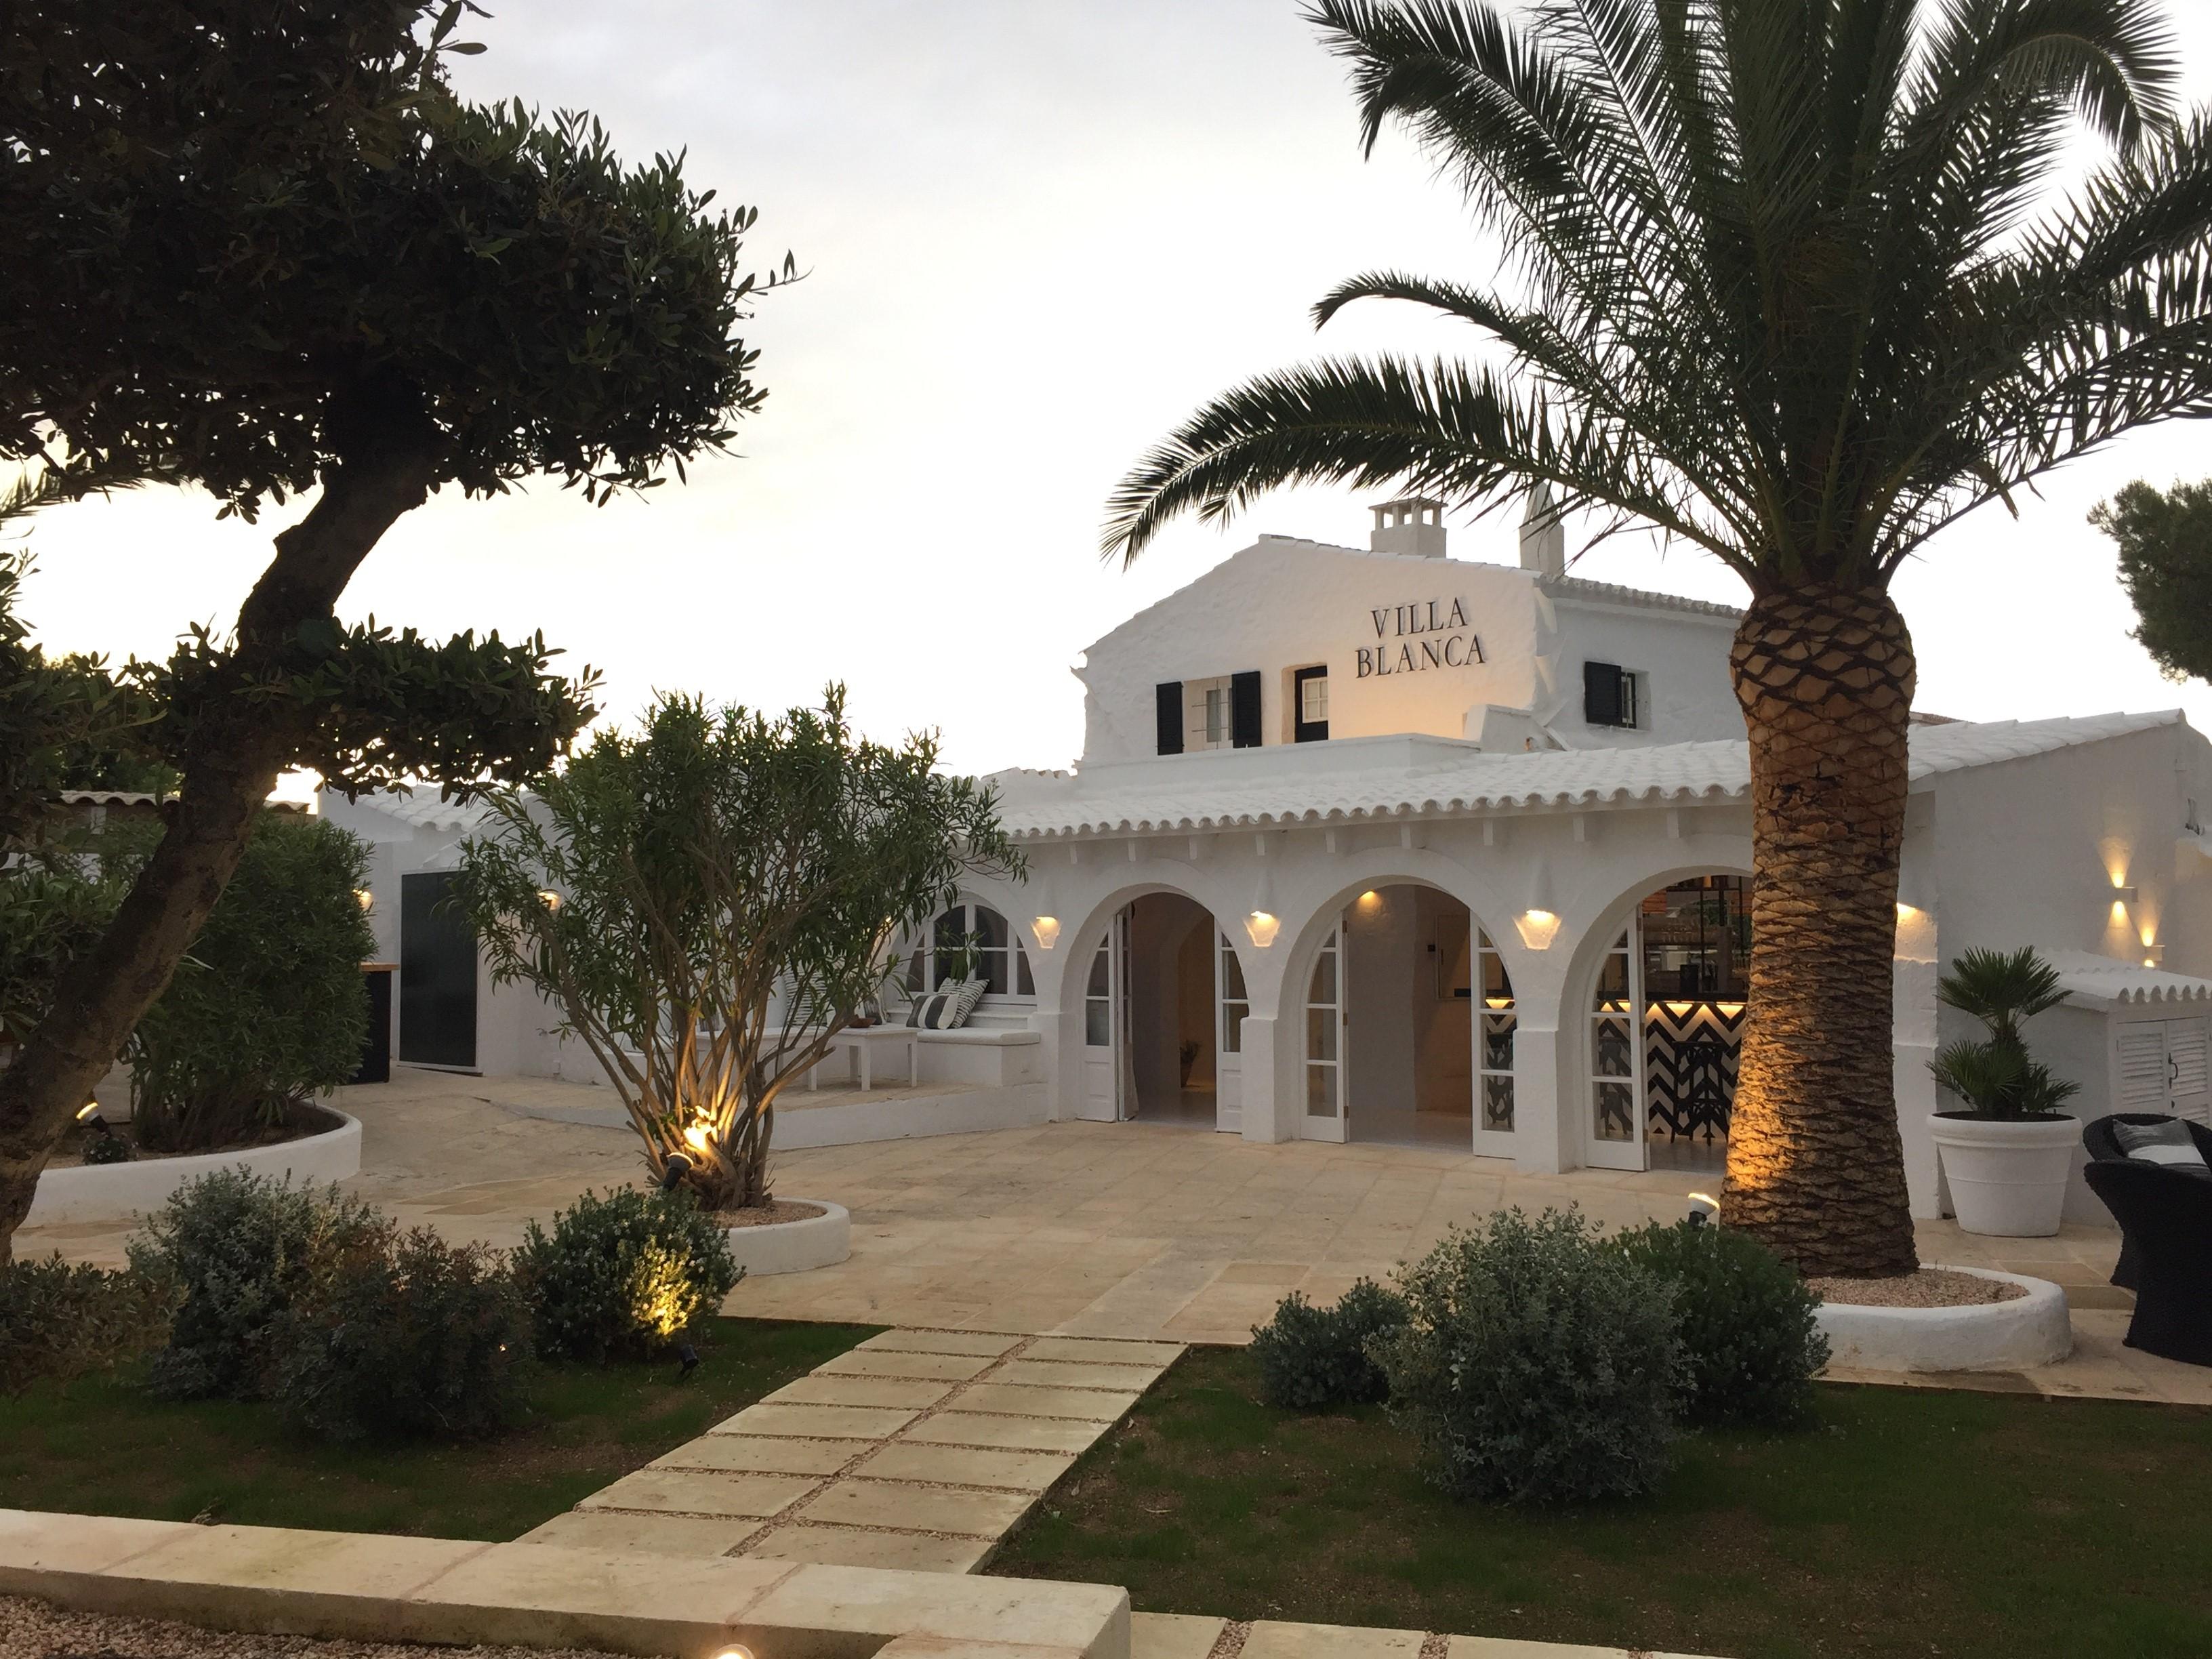 Villa blanca - From Anakena to Villa Blanca